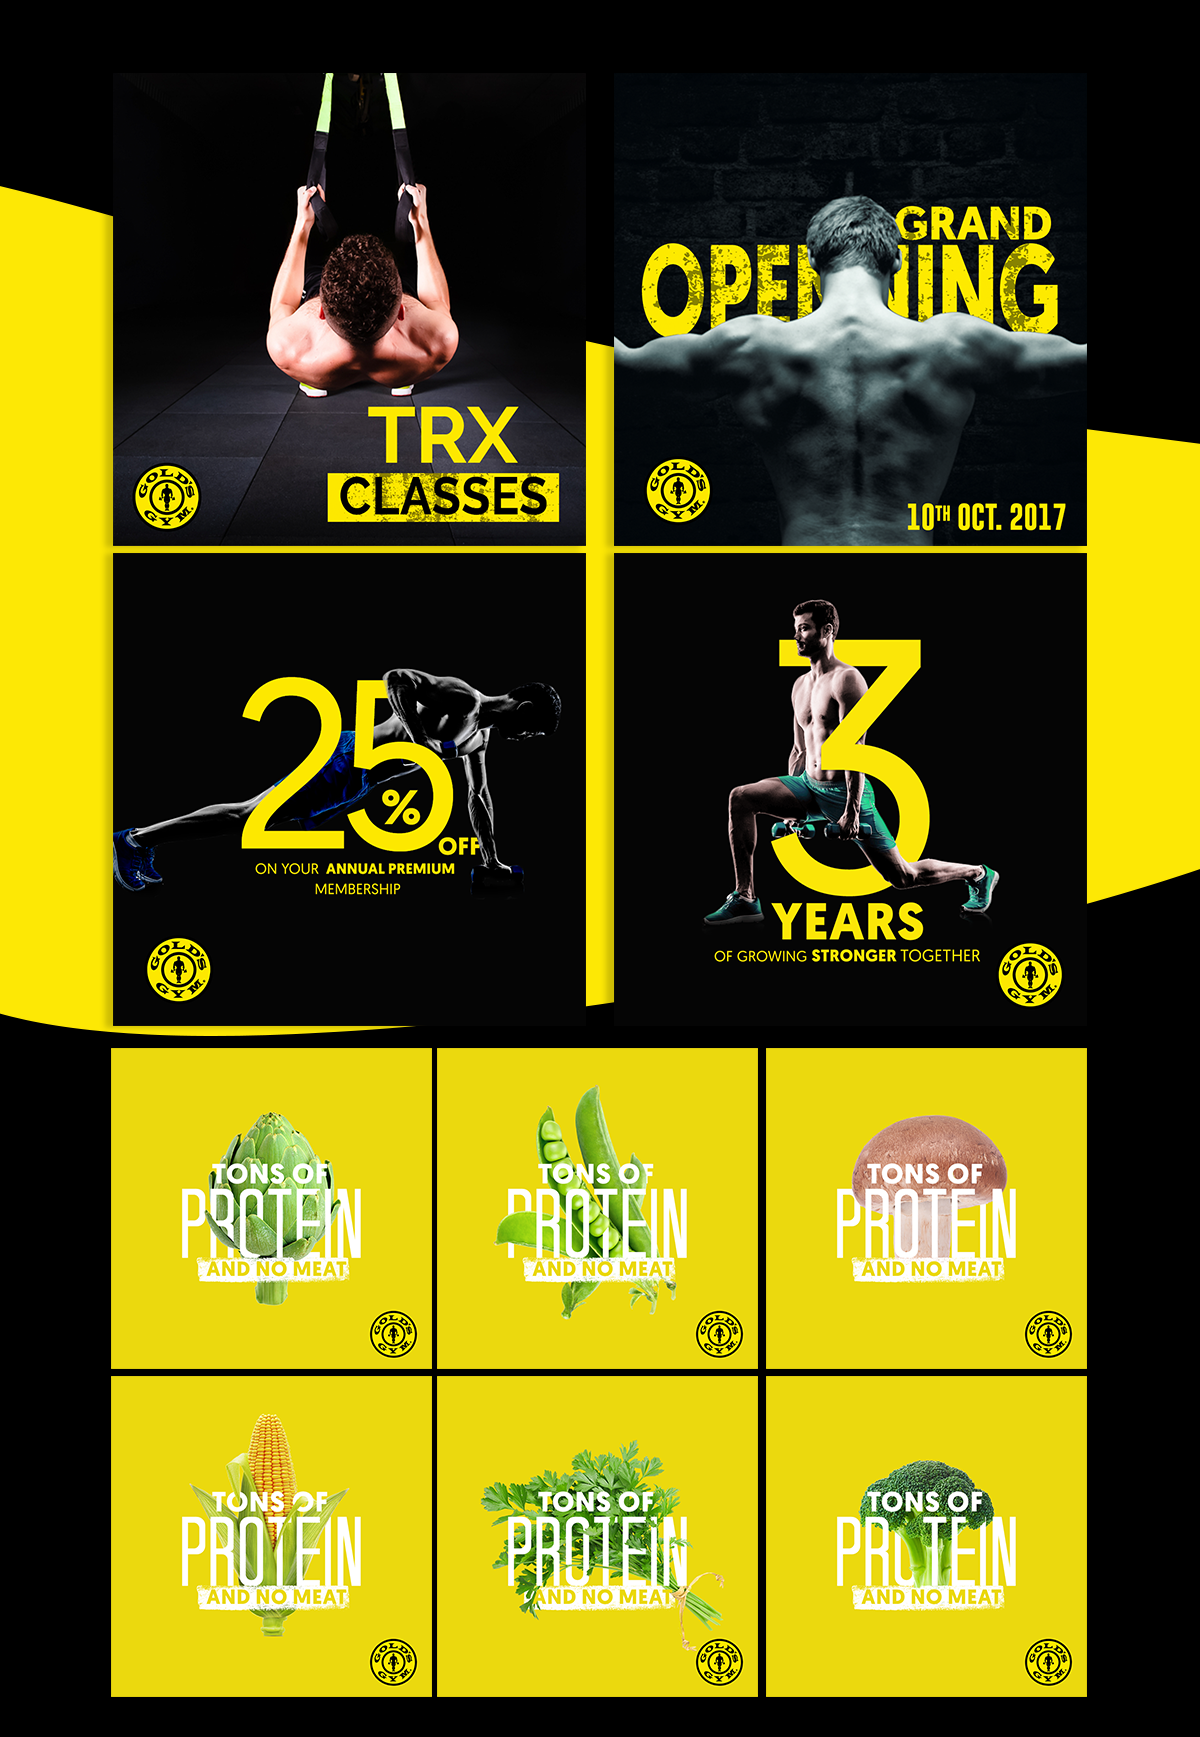 golds gym social media digital marketing sports cross fit golds gym kick boxing